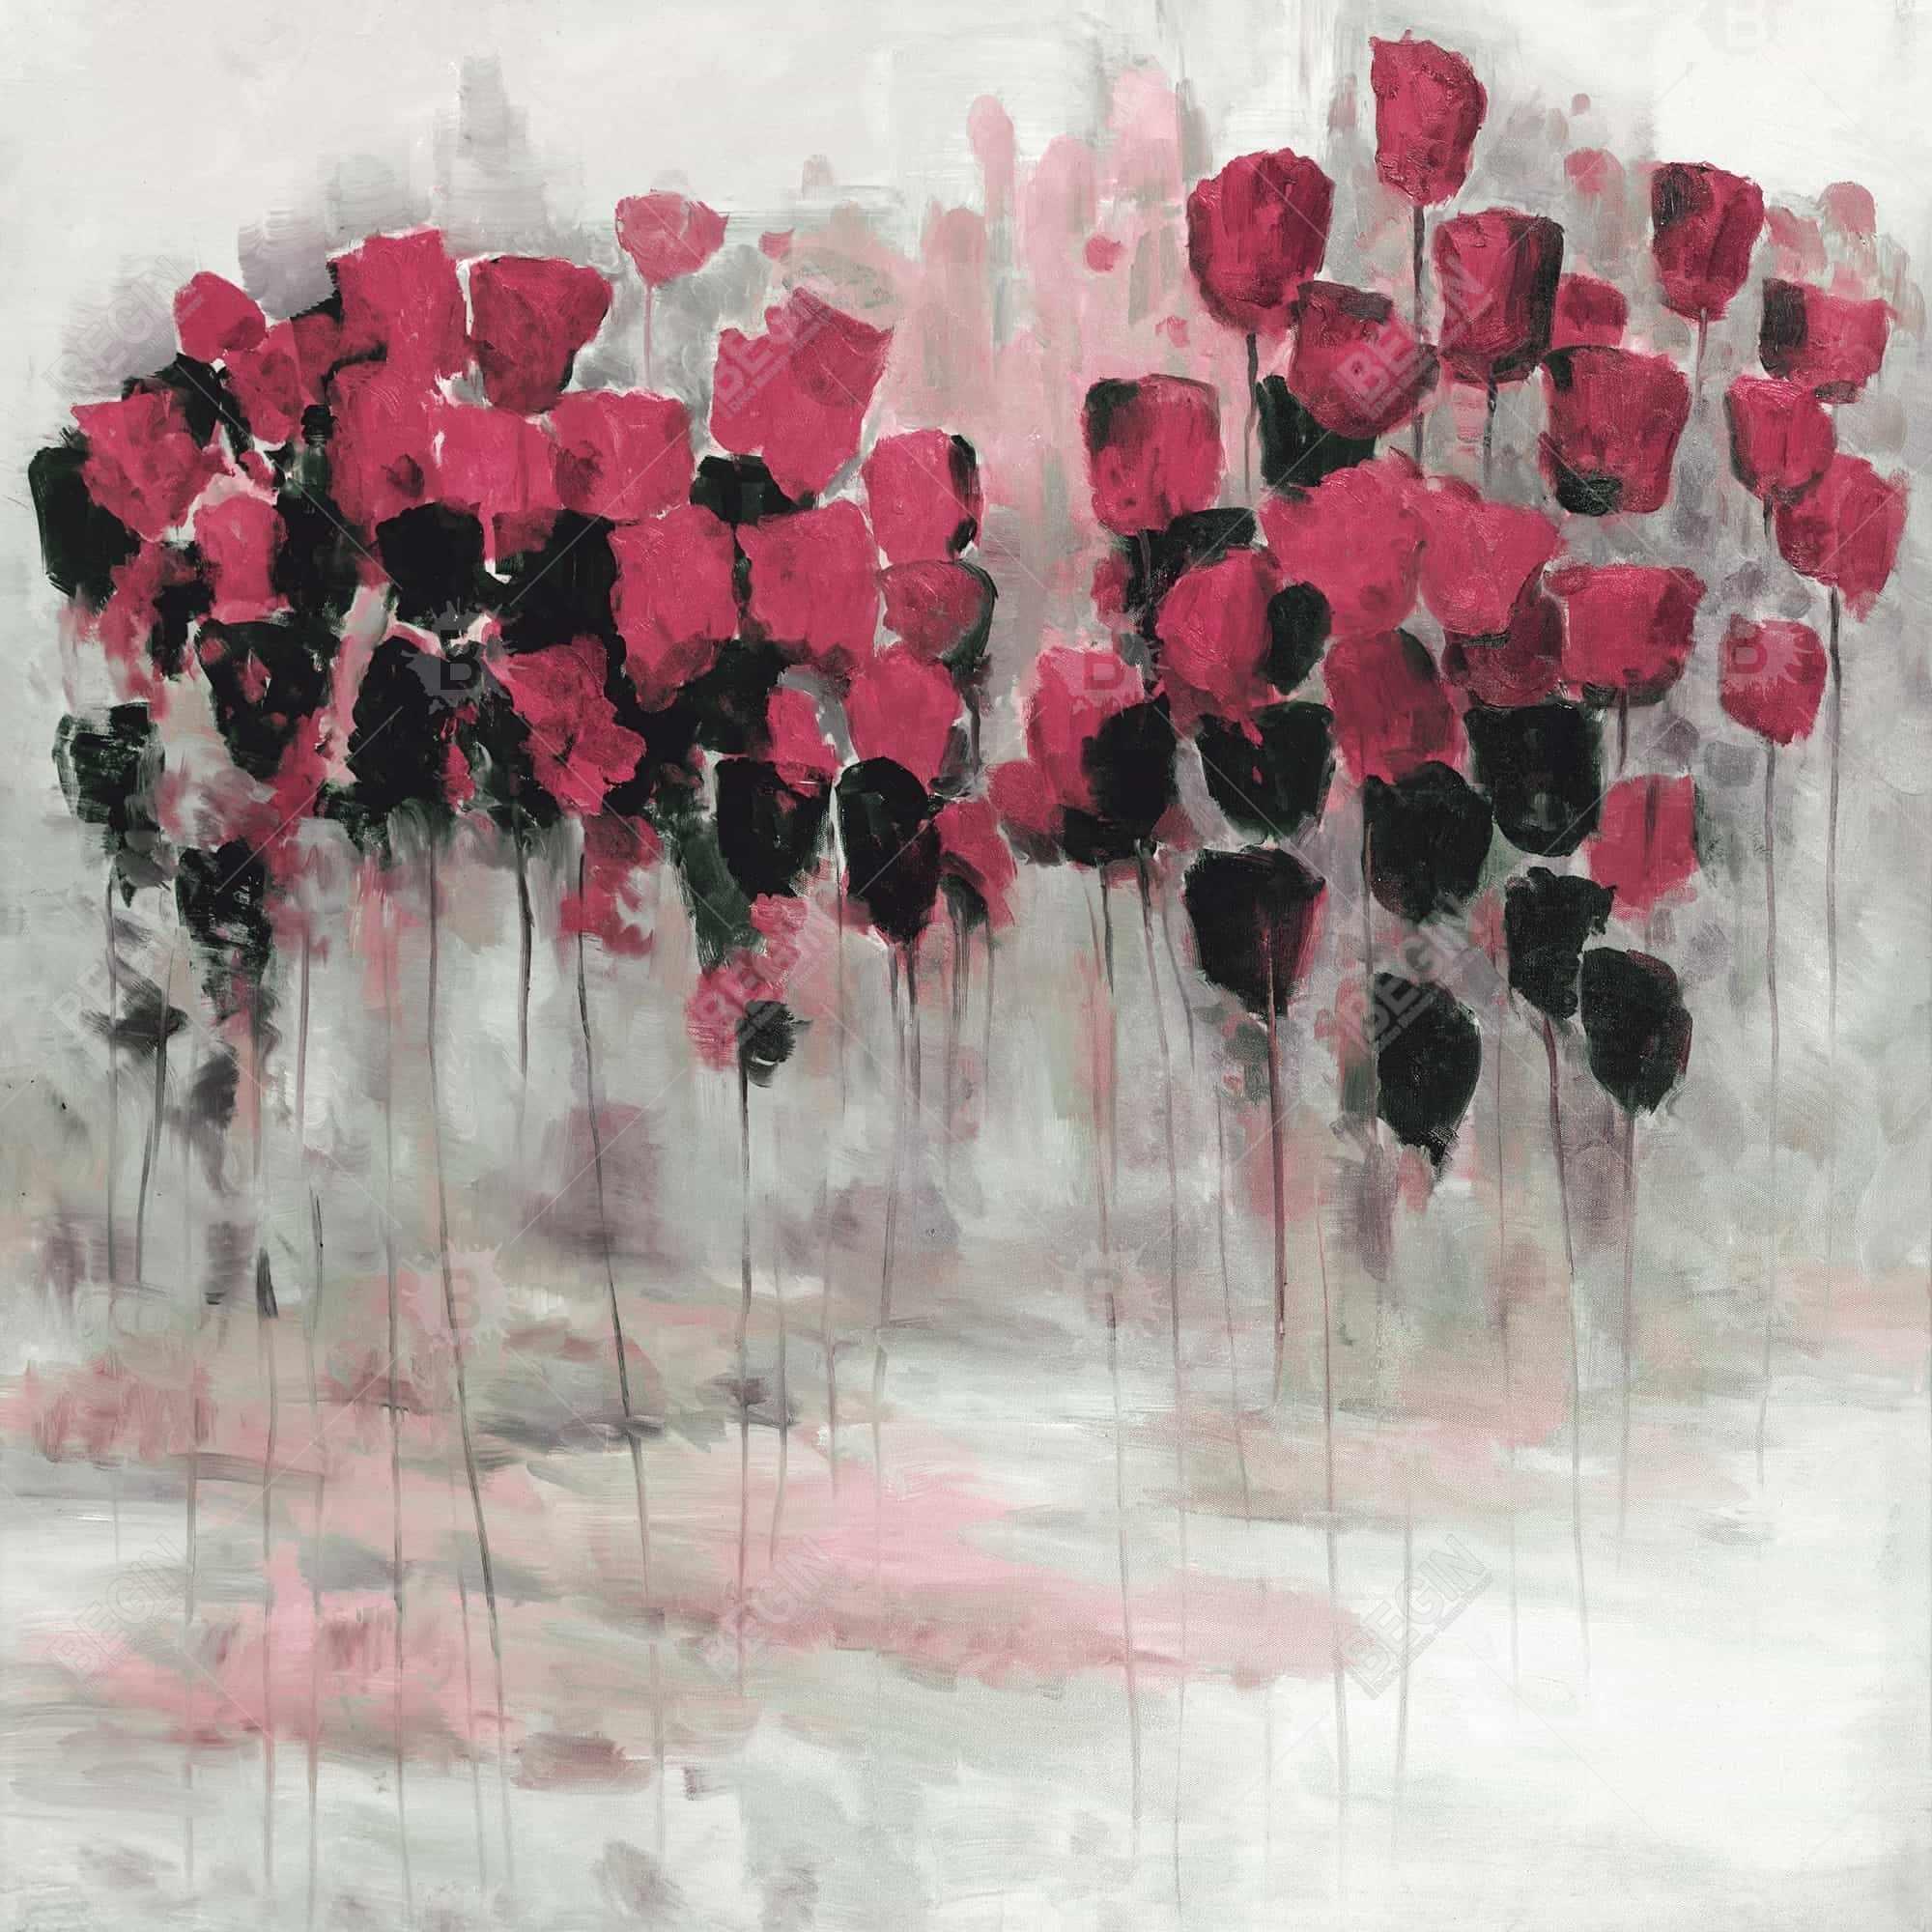 Pink black flowers field